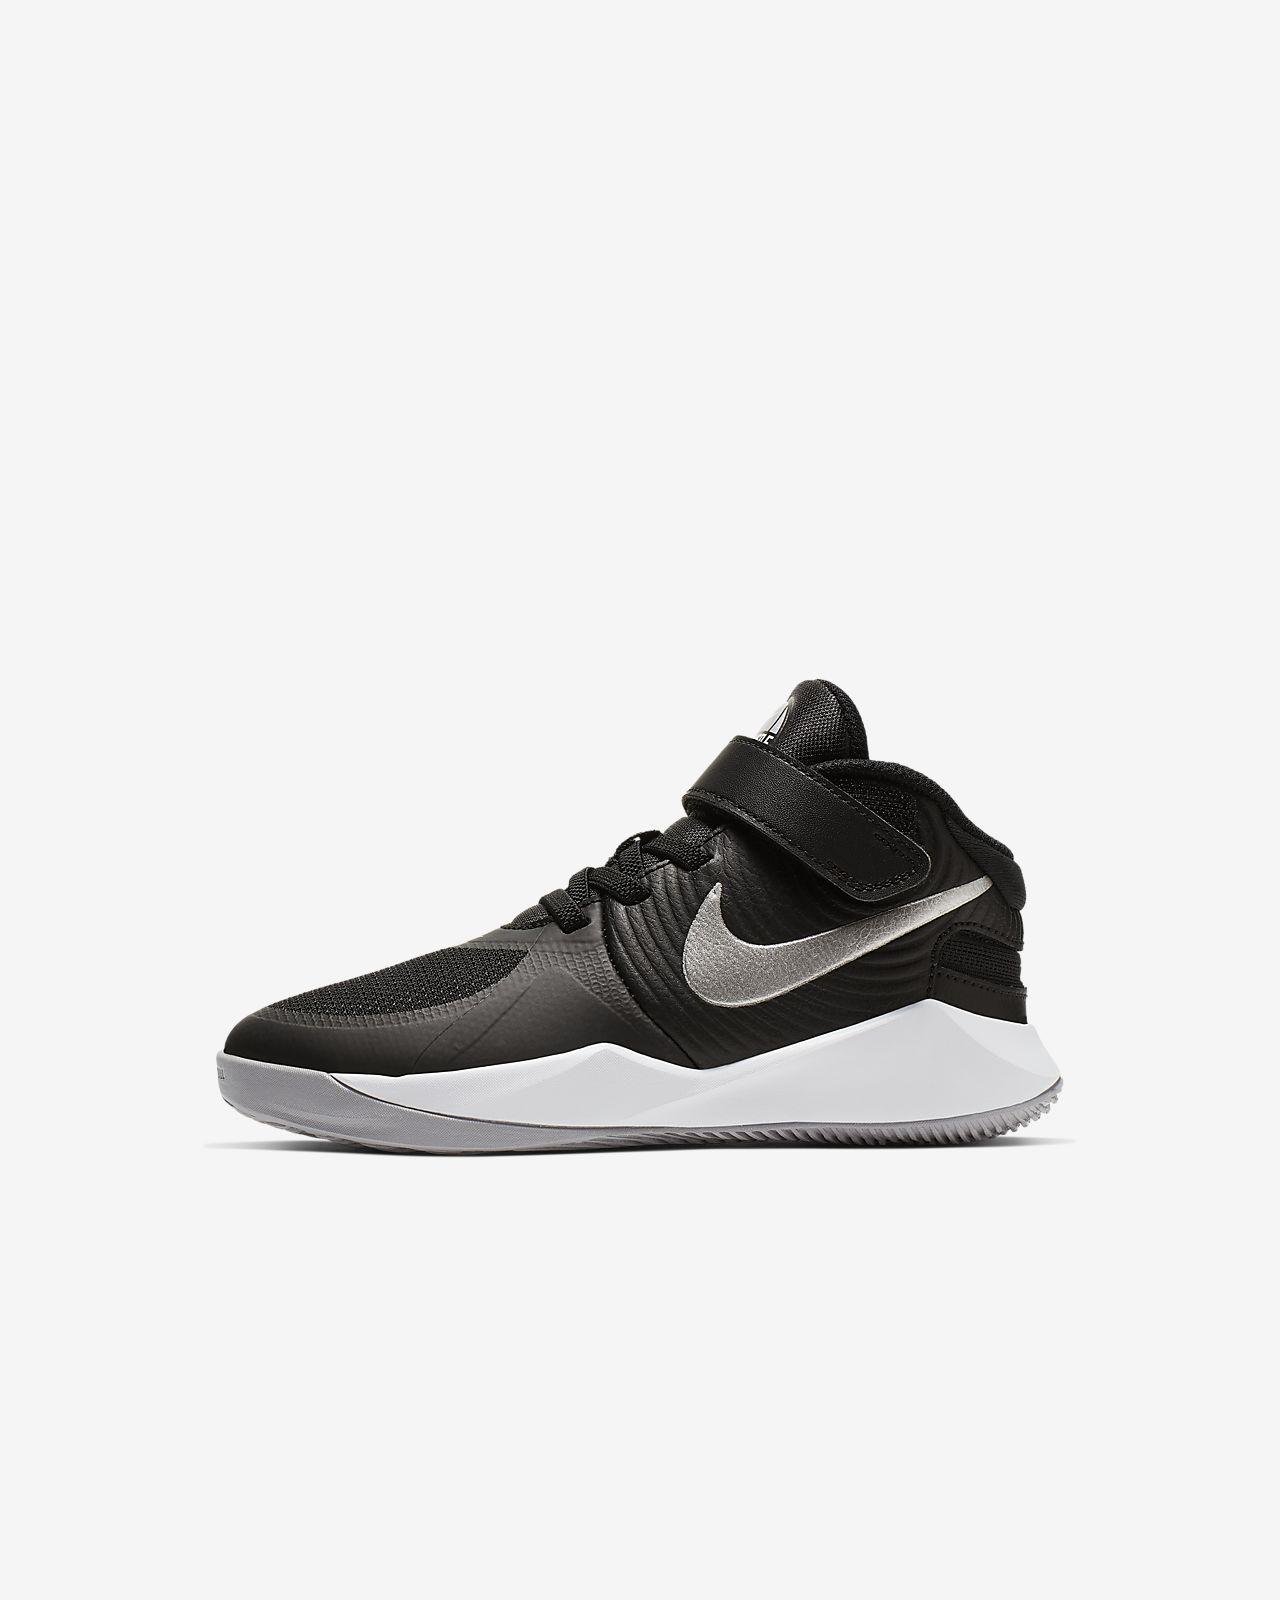 Sapatilhas Nike Team Hustle D 9 Flyease para criança